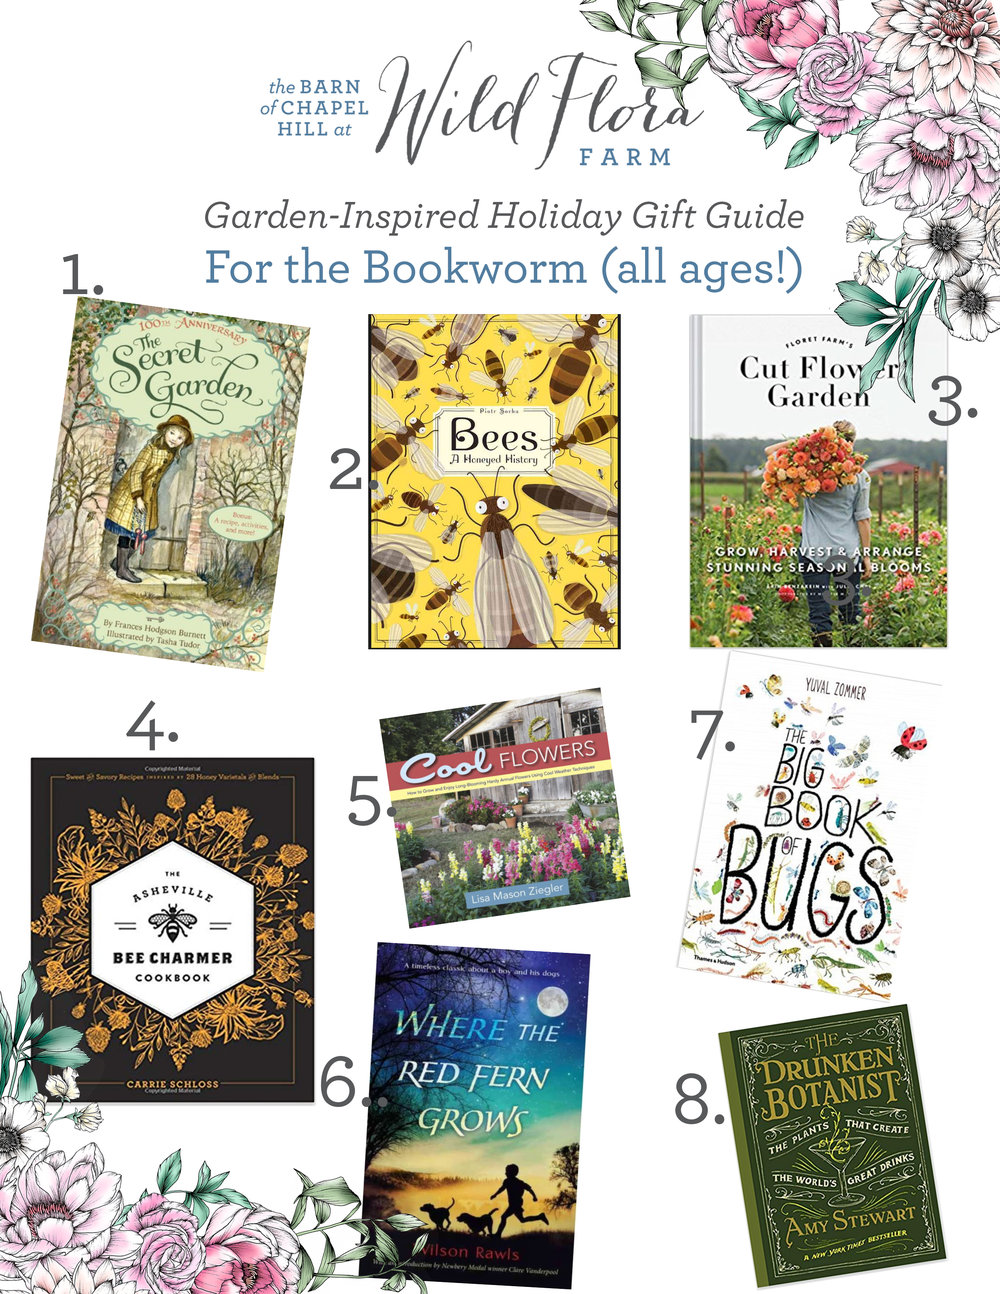 wild_flora_farm_bookworm_garden_gift_guide.jpg